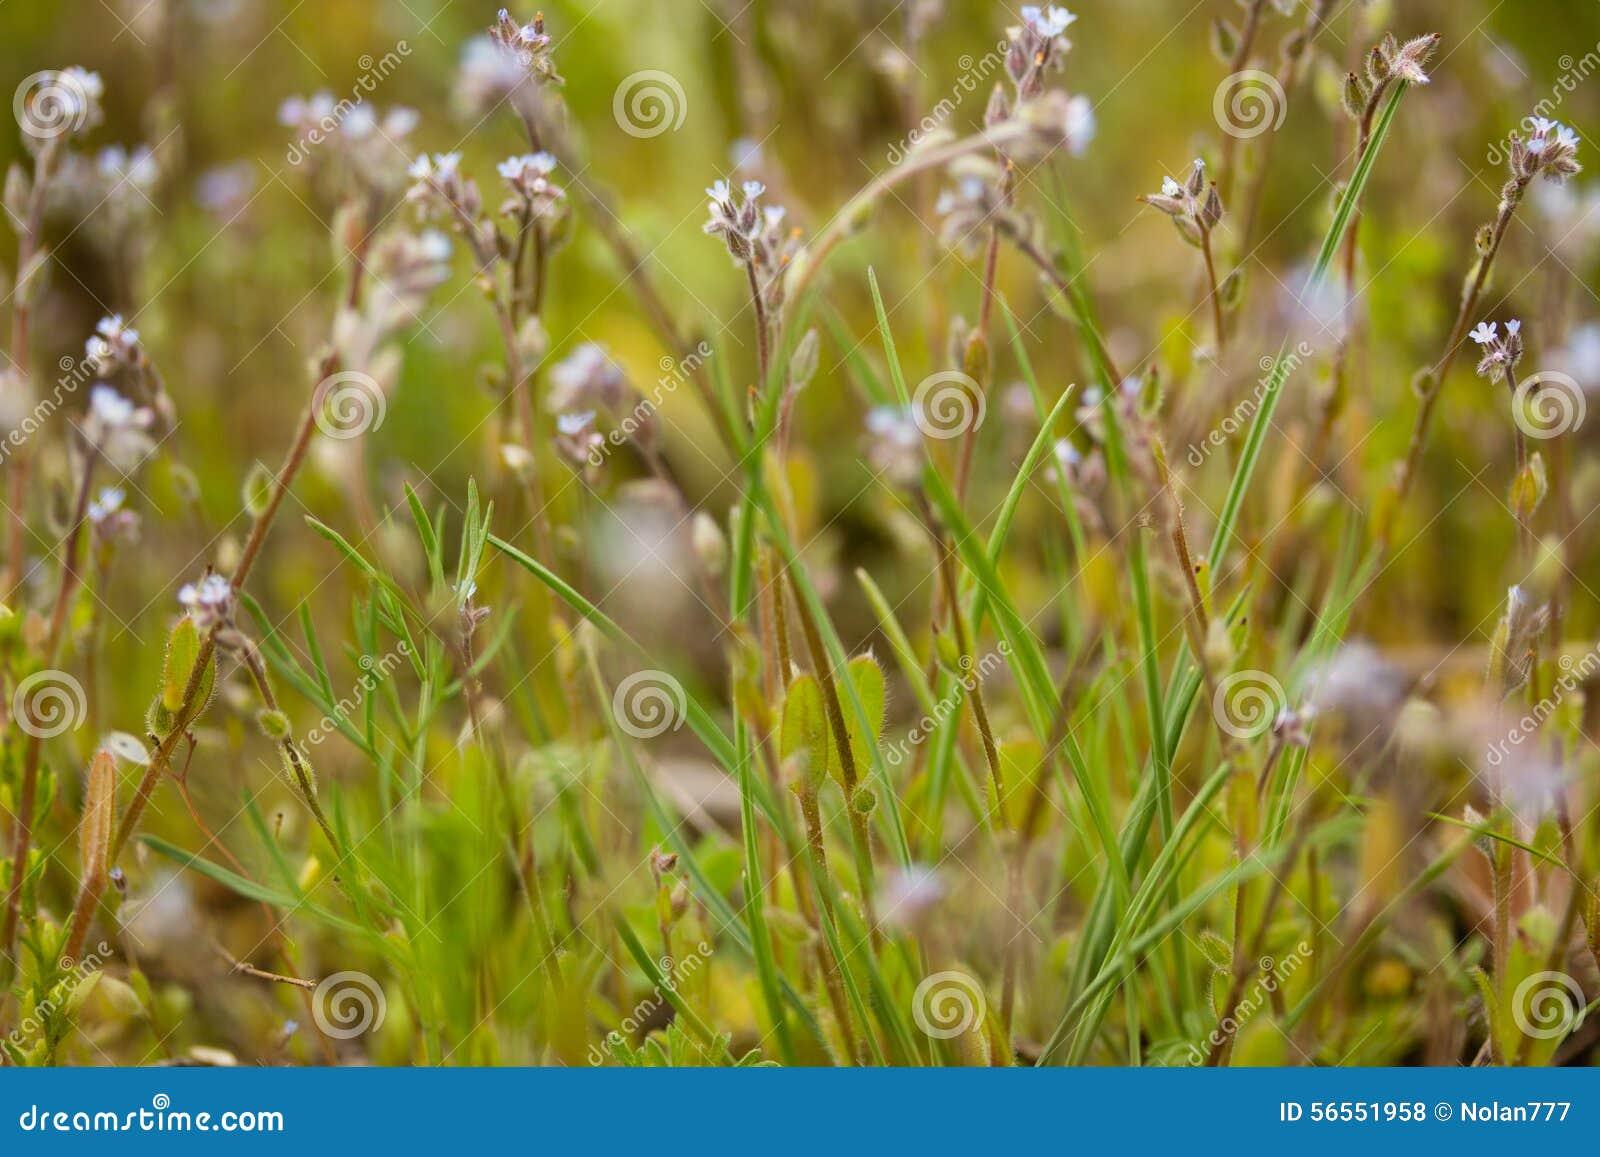 Download Μπλε λουλούδια προς το λιβάδι Στοκ Εικόνες - εικόνα από φρέσκος, χρώμα: 56551958